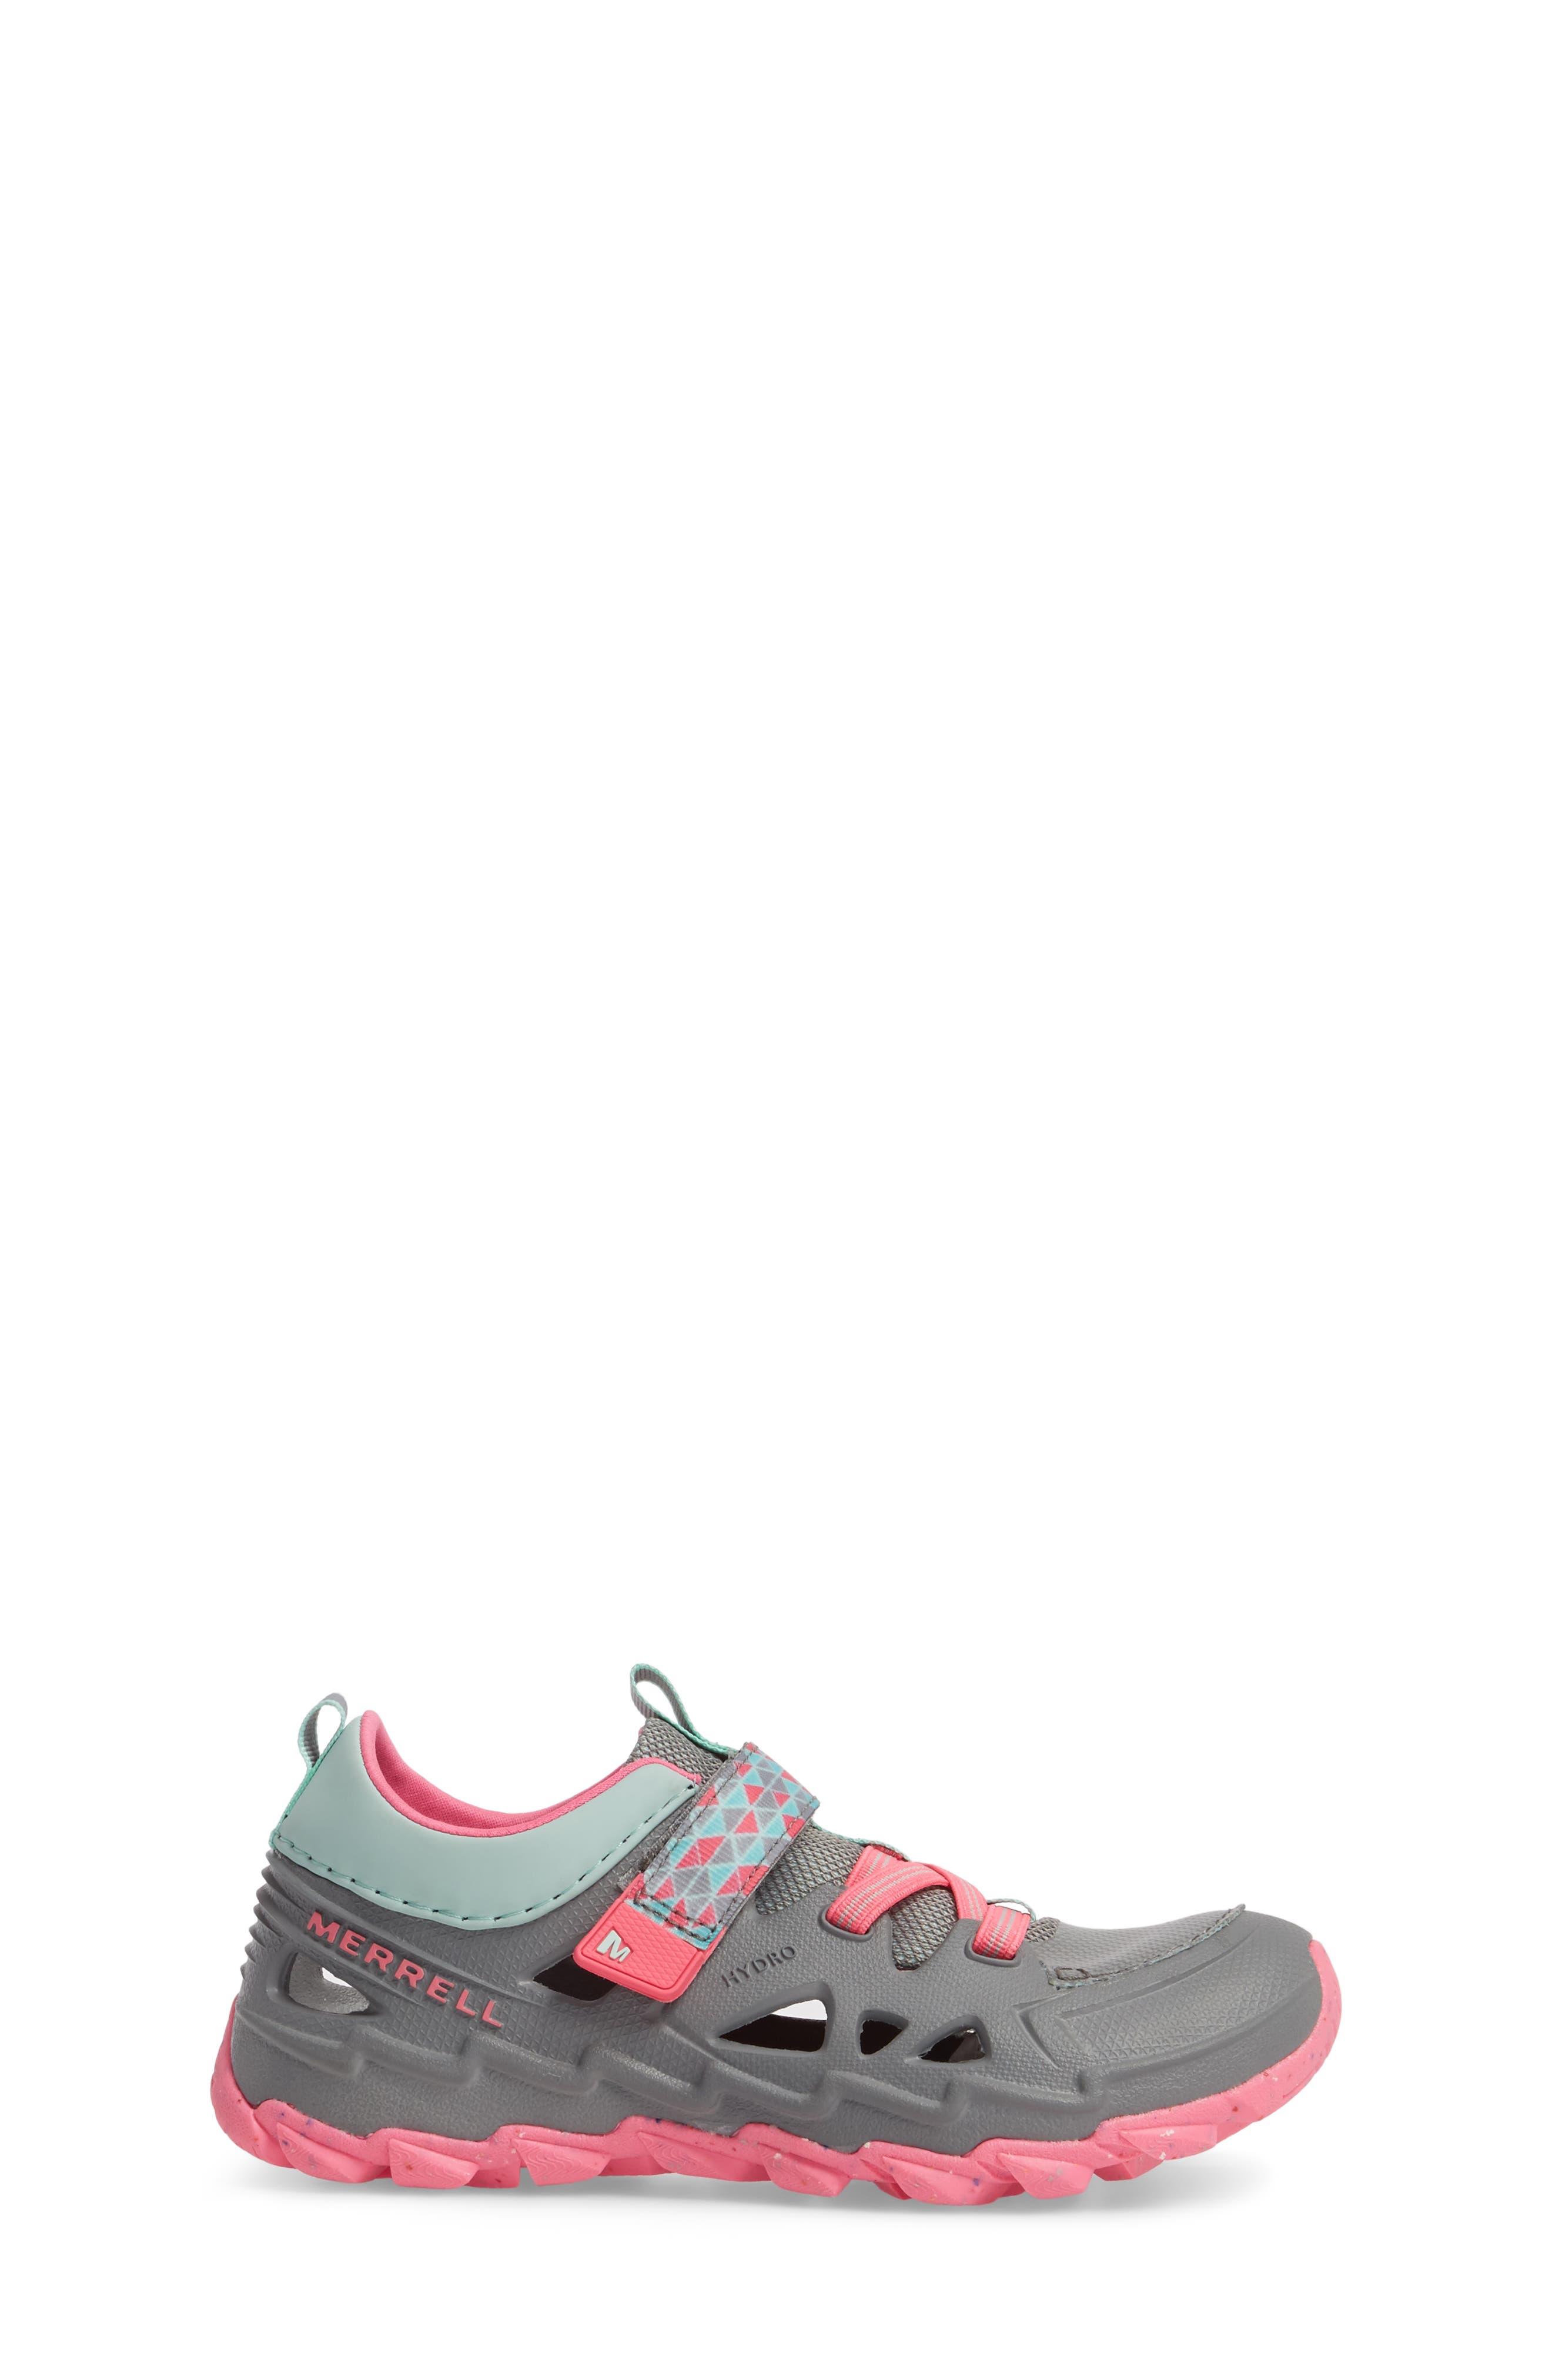 Hydro 2.0 Water Friendly Sneaker,                             Alternate thumbnail 3, color,                             Grey/ Multi